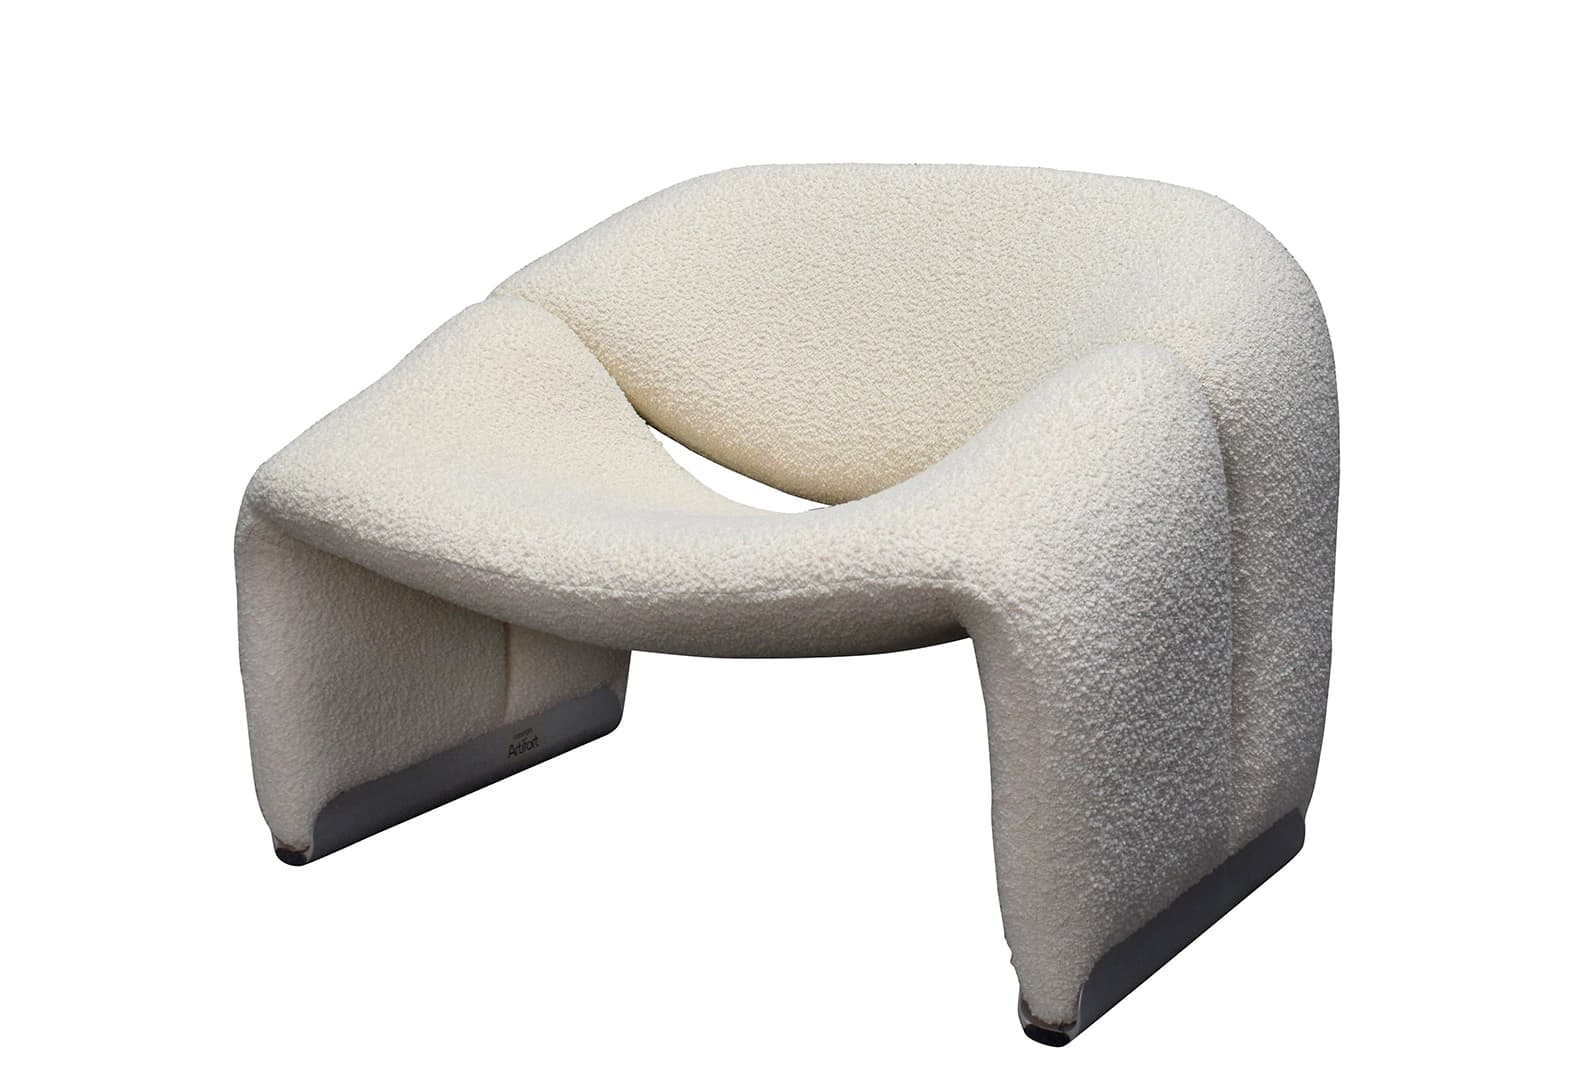 Groovy Lounge Chair, Artifort (дизайн Пьер Полен)